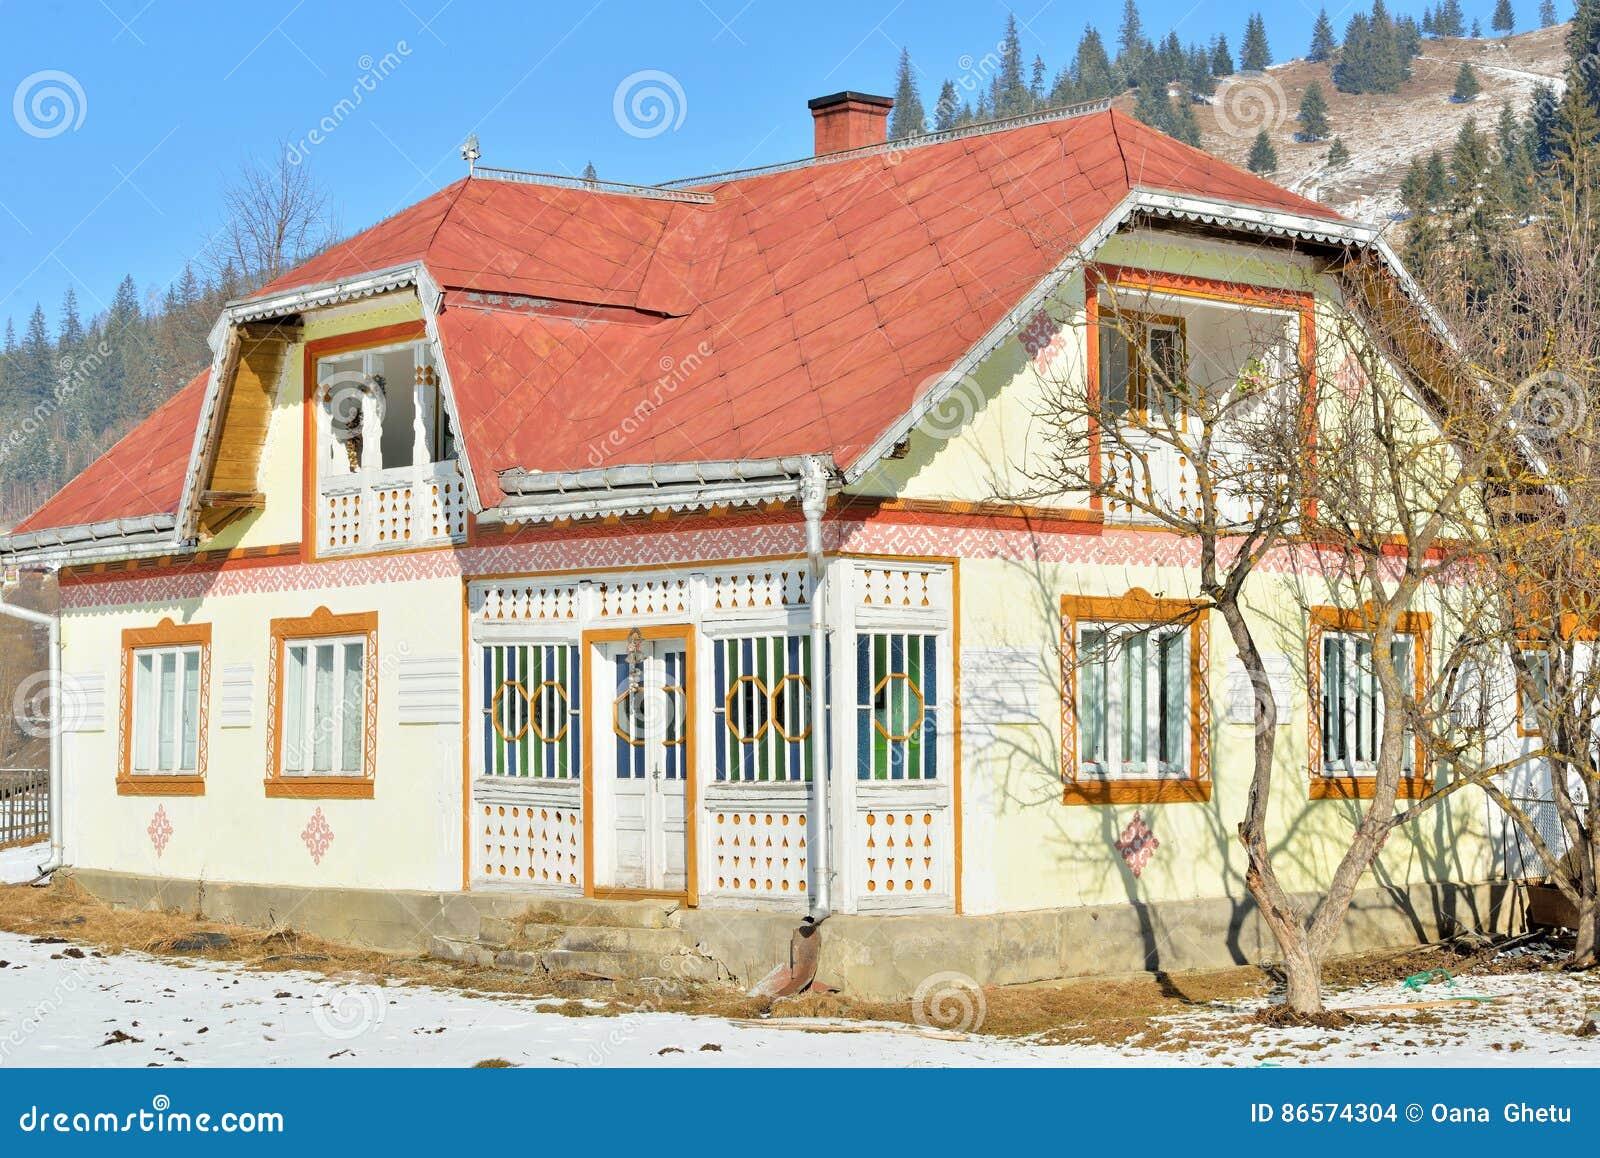 Häuser gemalt wie Ostereier, im Dorf Ciocanesti, Grafschaft Suceava, Rumänien